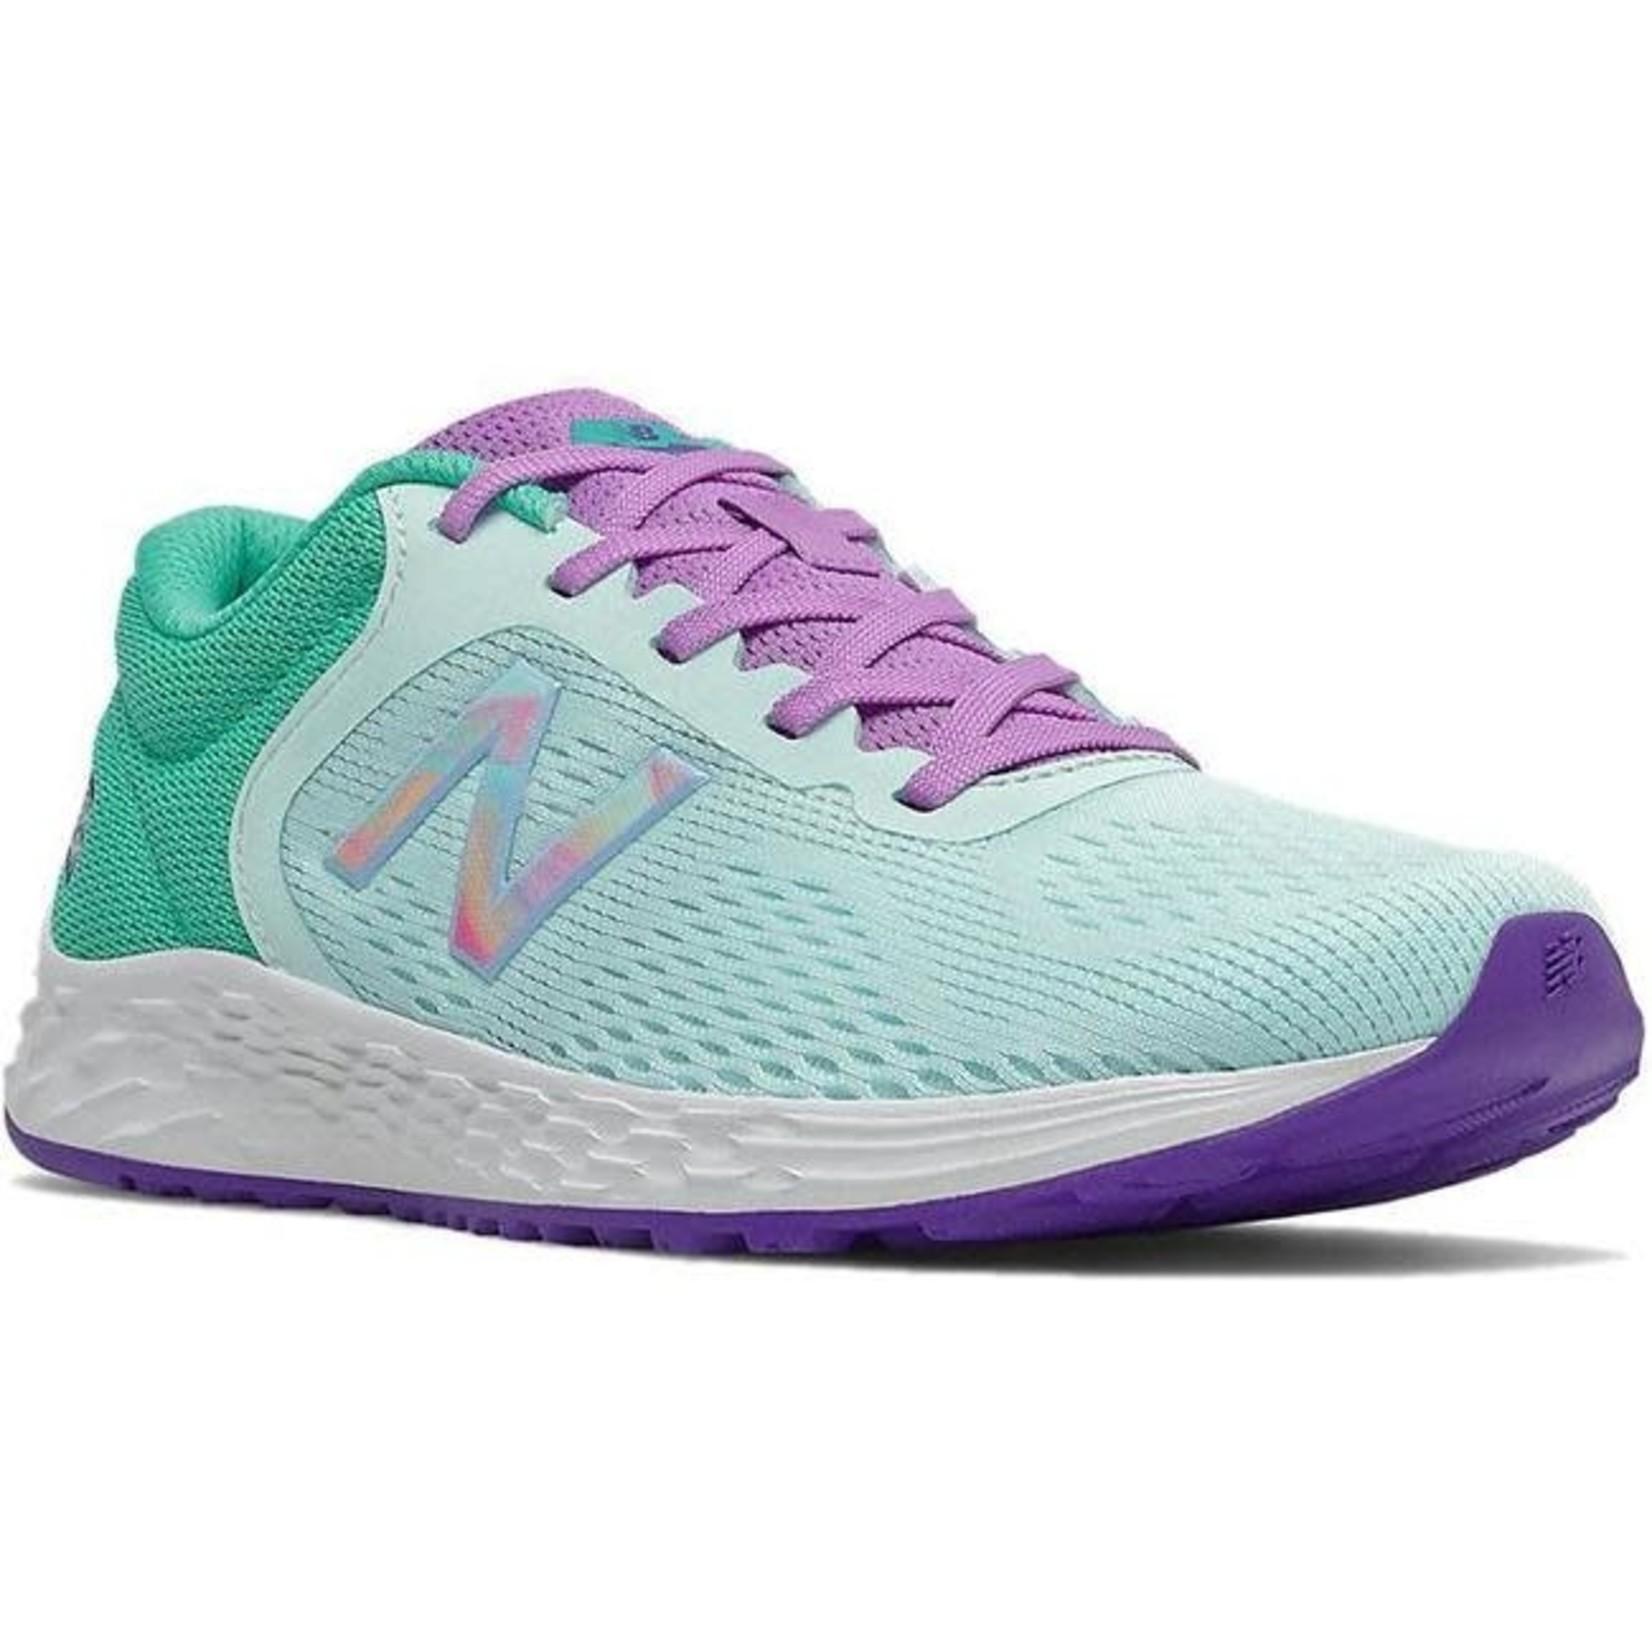 New Balance New Balance Running Shoes, Arishi v2, GGS, Girls